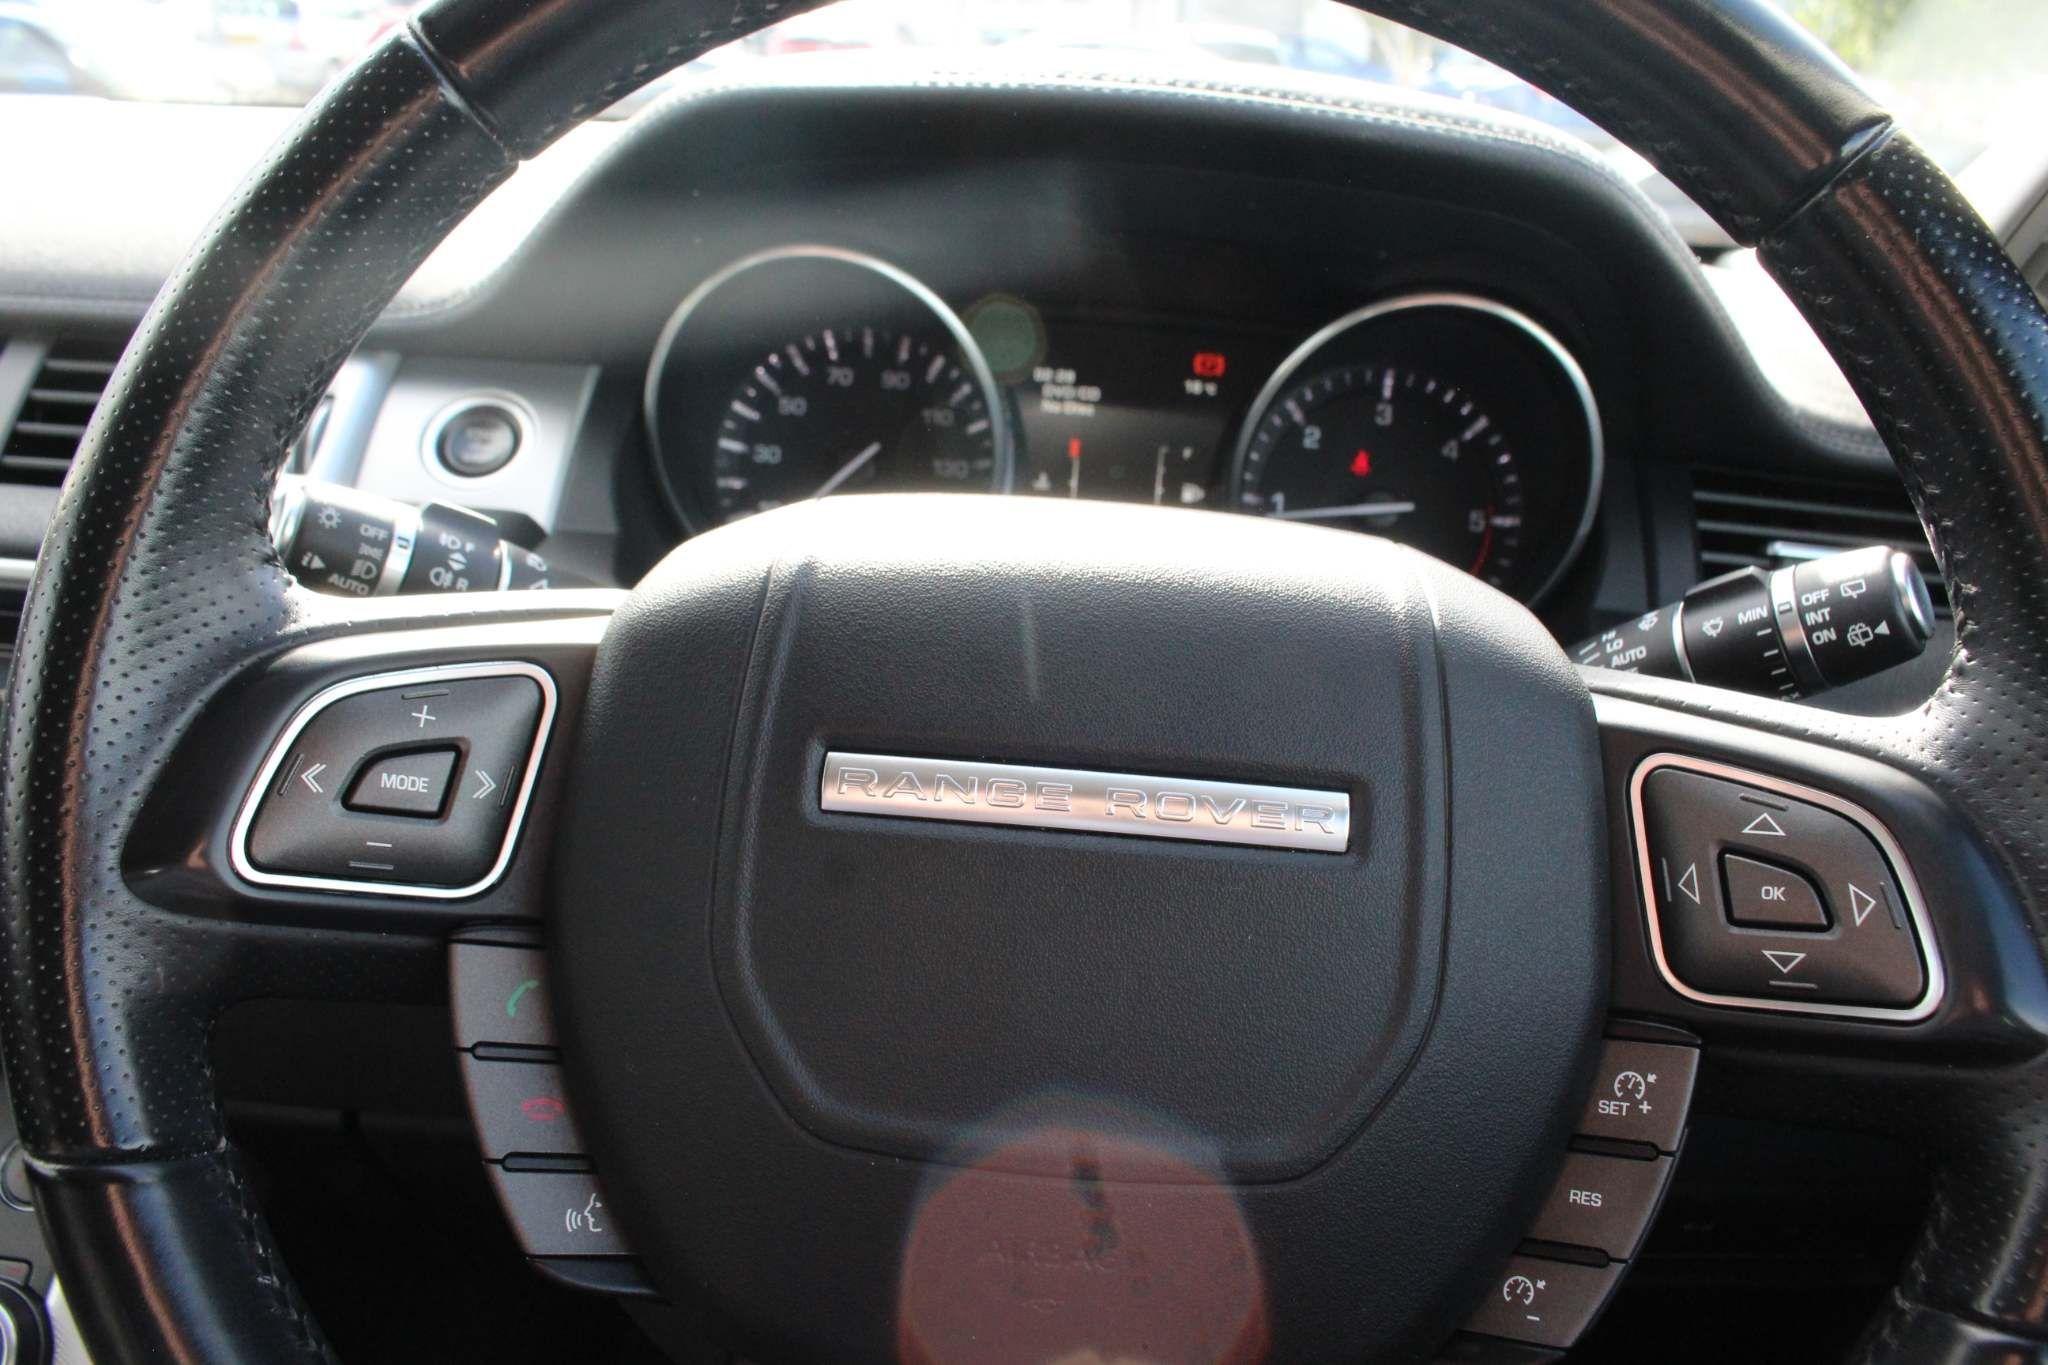 Land Rover Range Rover Evoque Images